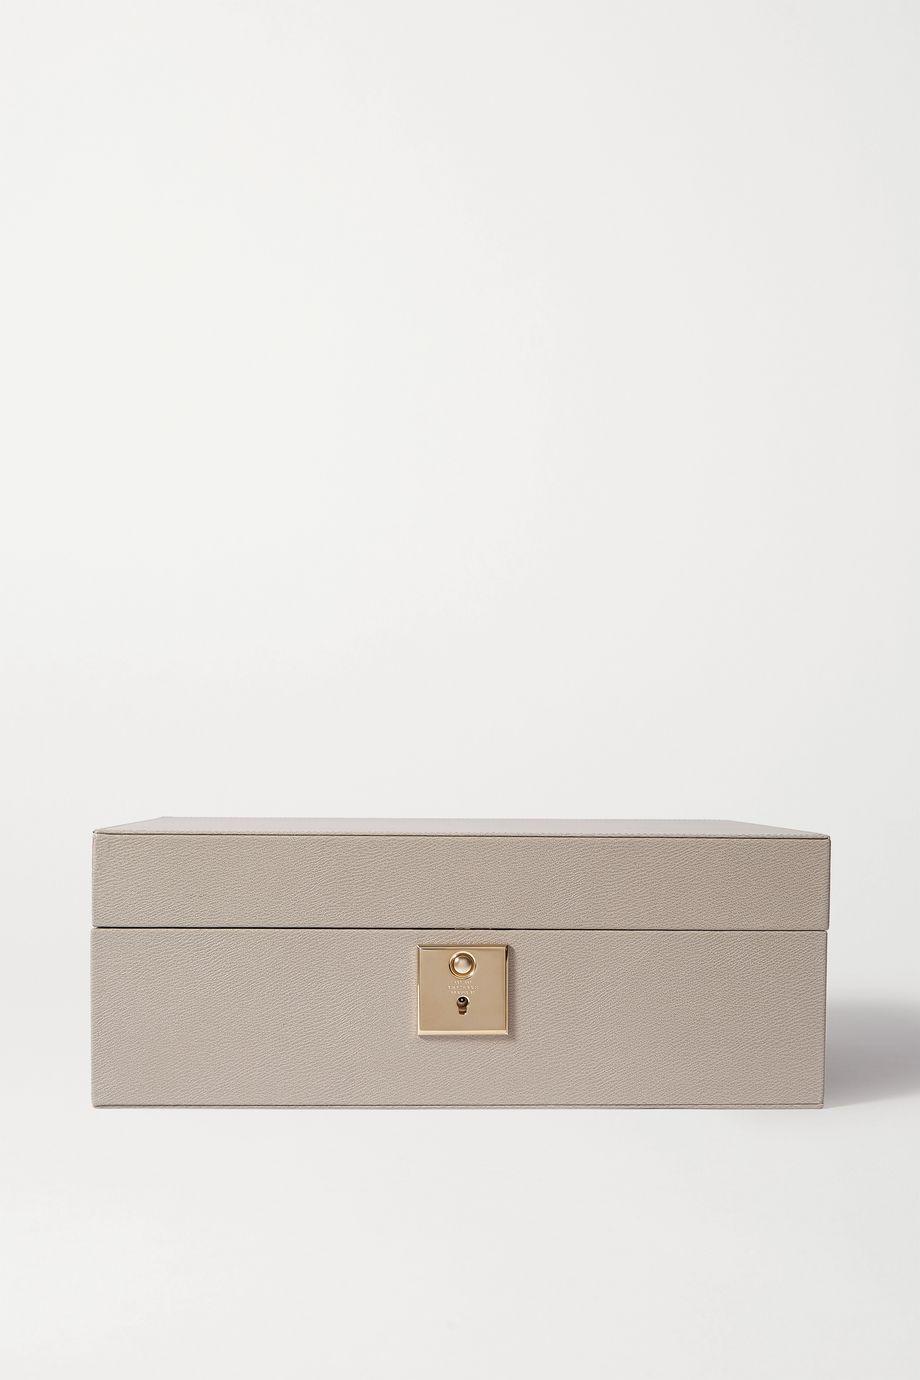 Smythson Grosvenor leather jewelry box